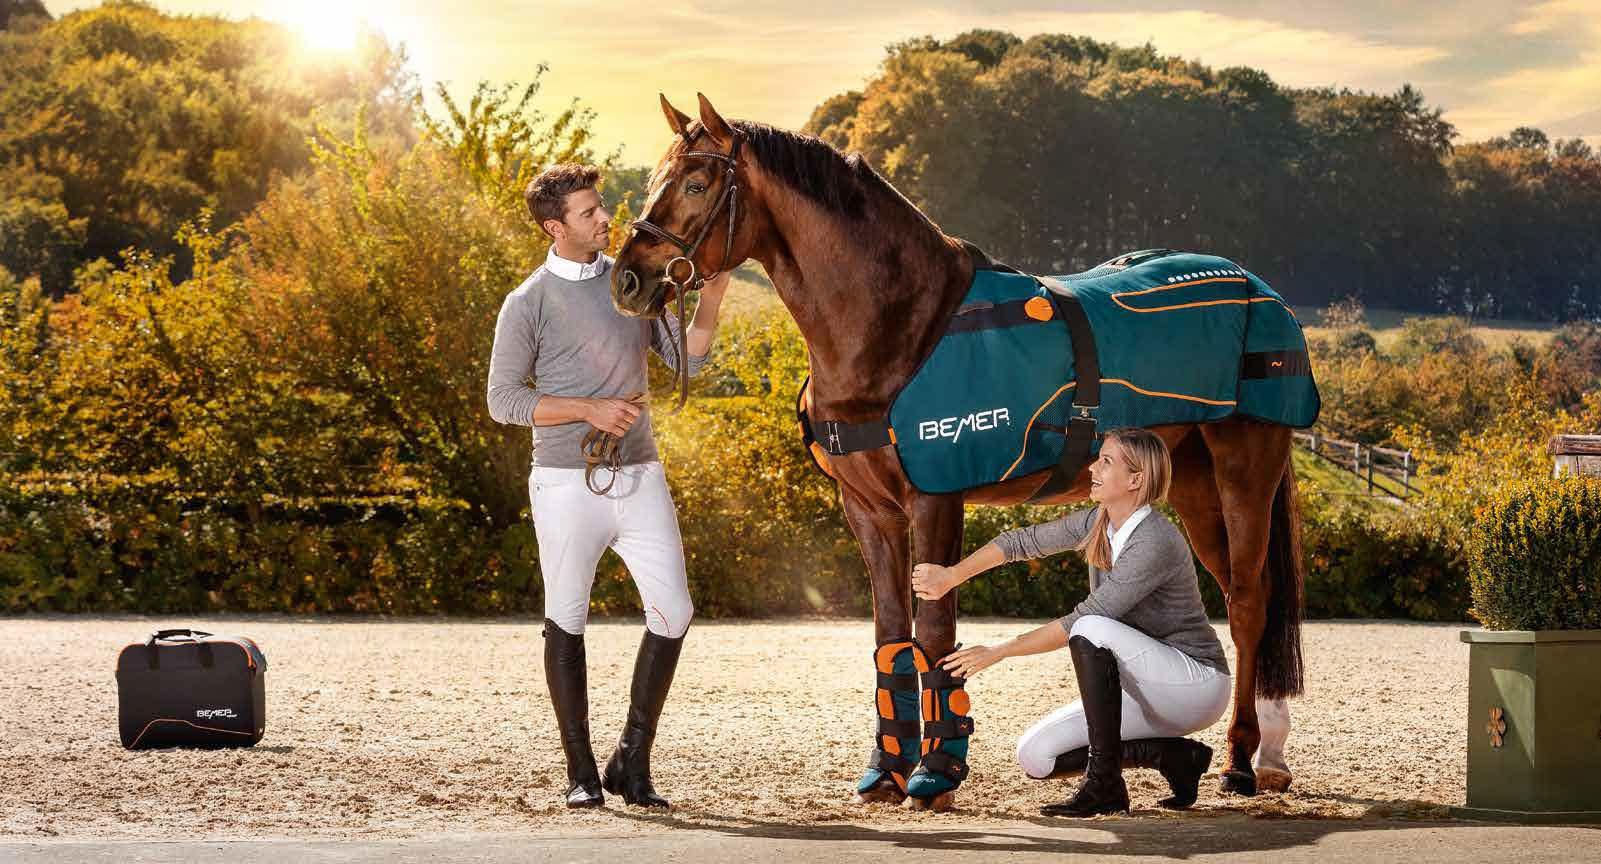 BEMER Equestrian PEMF